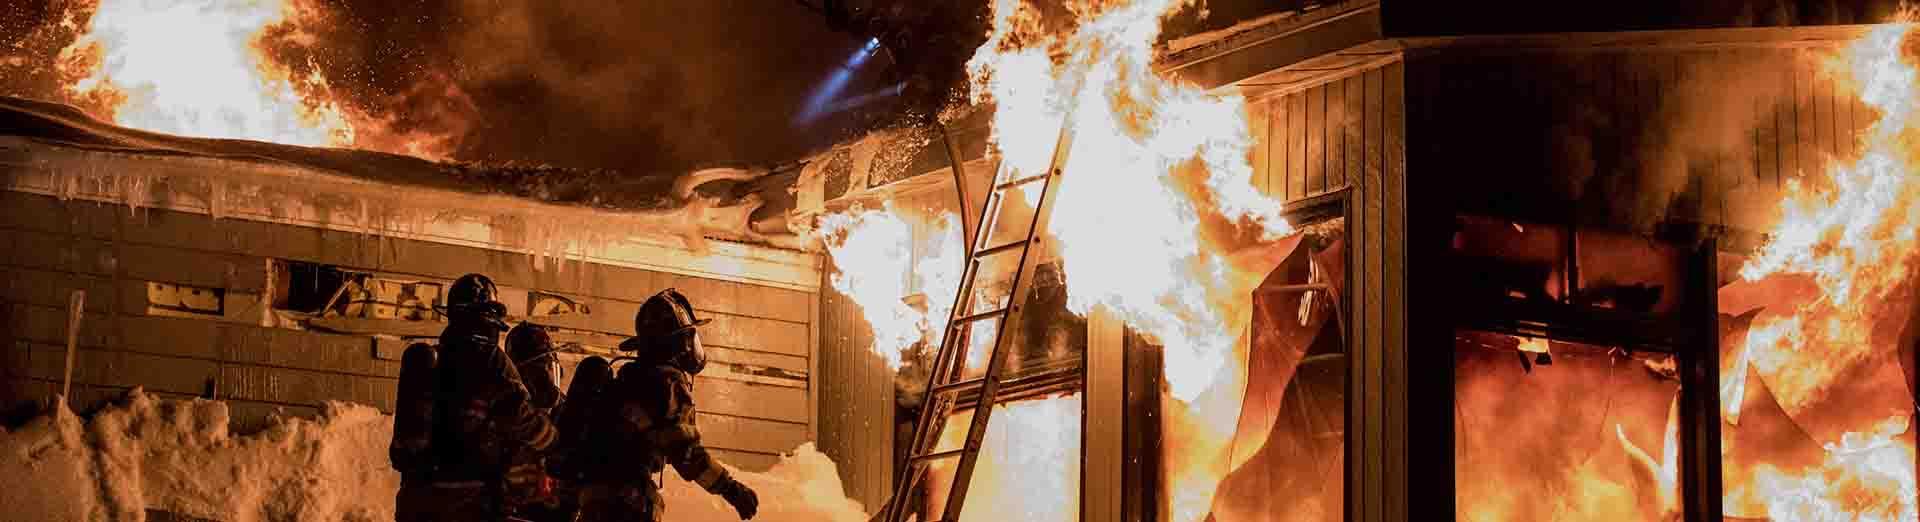 fire-damage-banner